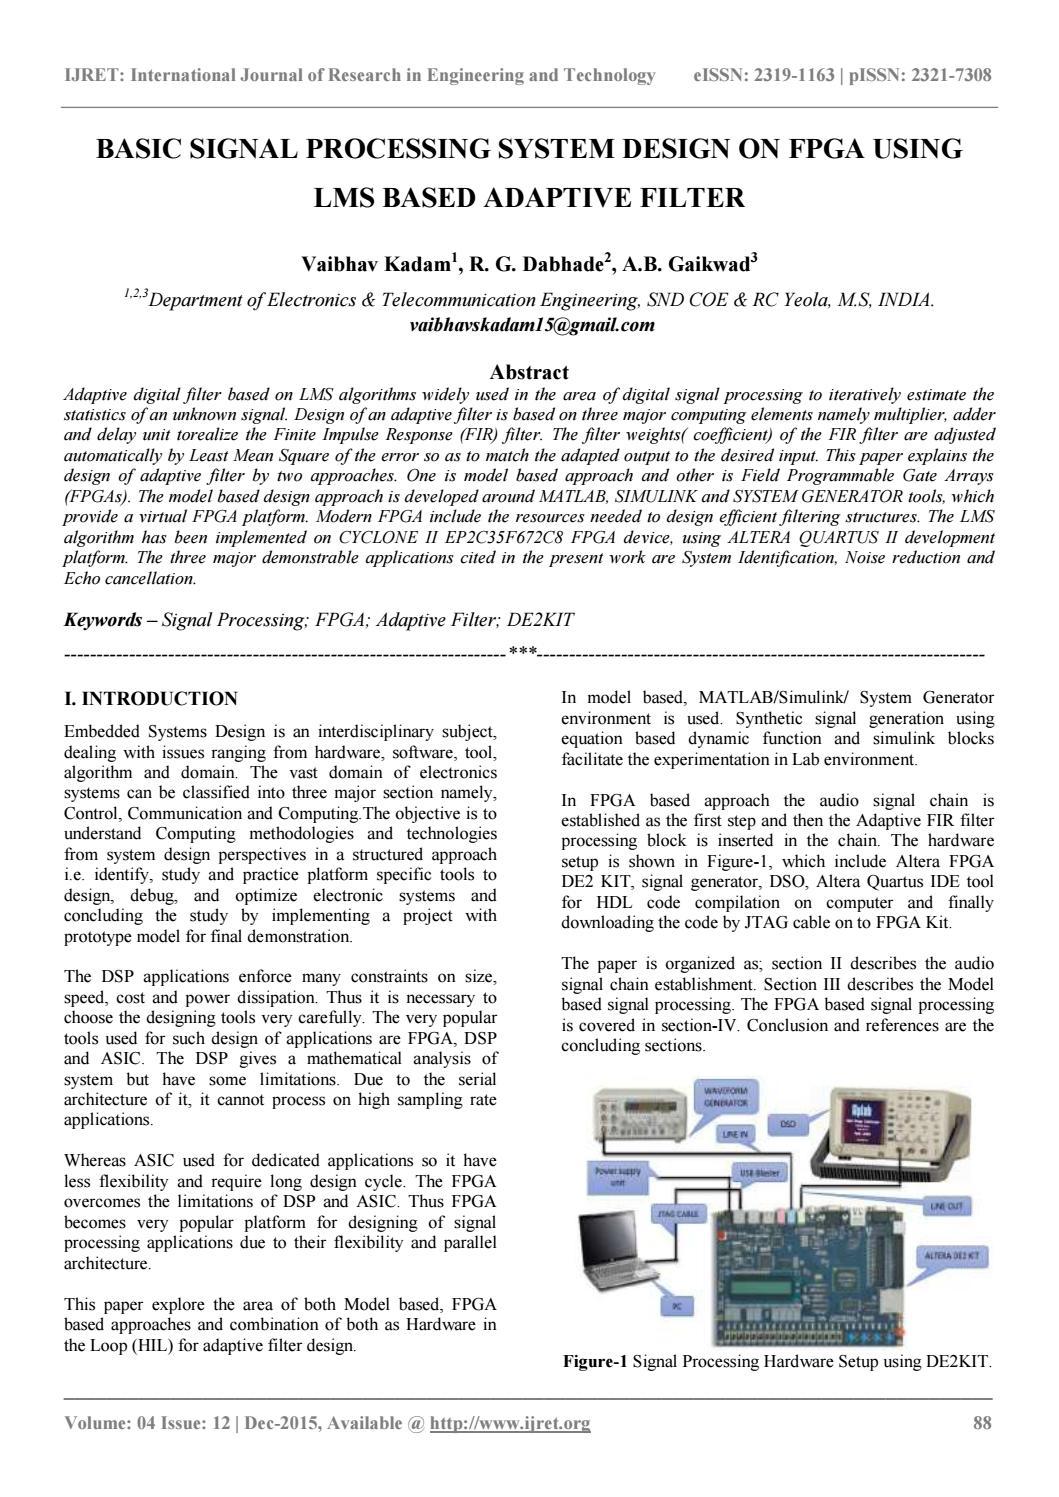 Basic signal processing system design on fpga using lms based adaptive  filter